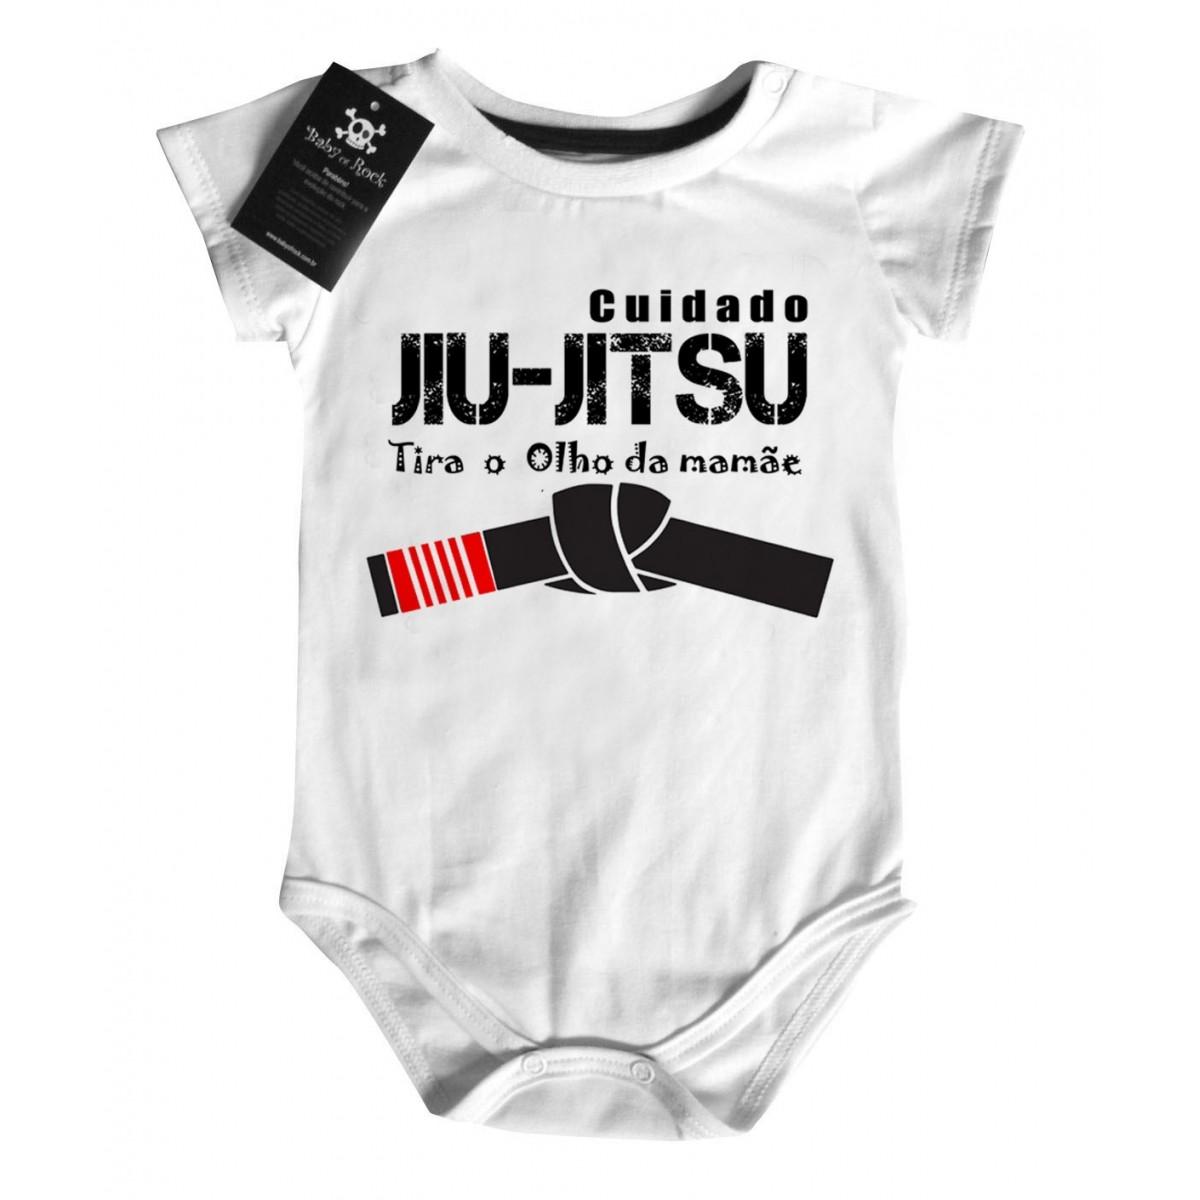 Body Divertido - Jiu Jitsu - White  - Baby Monster S/A